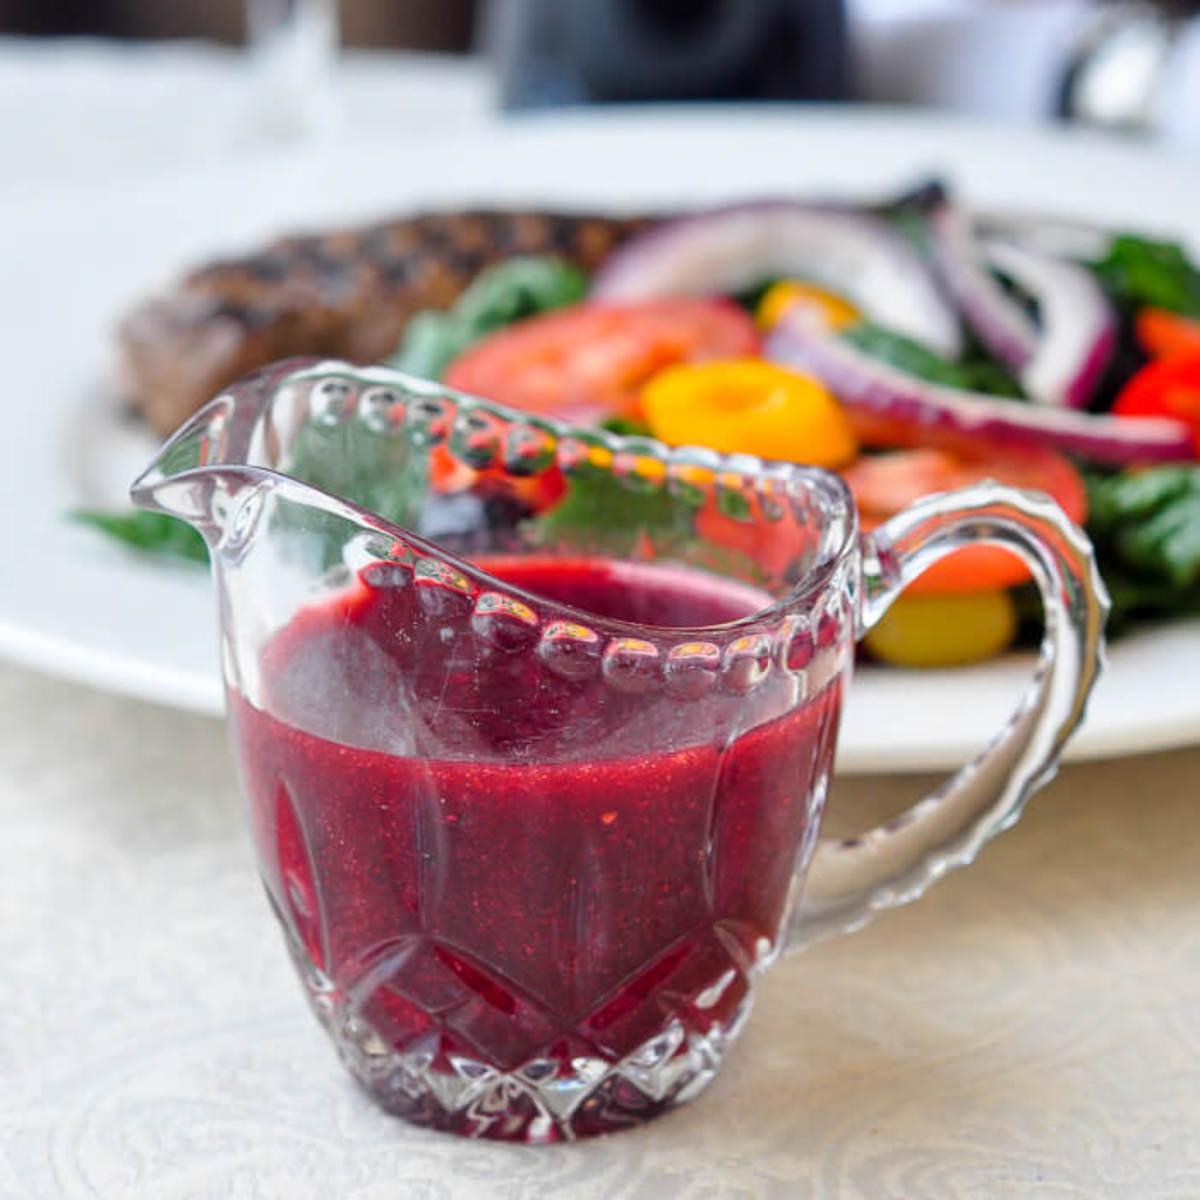 Fat-Free Raspberry Balsamic Vinaigrette